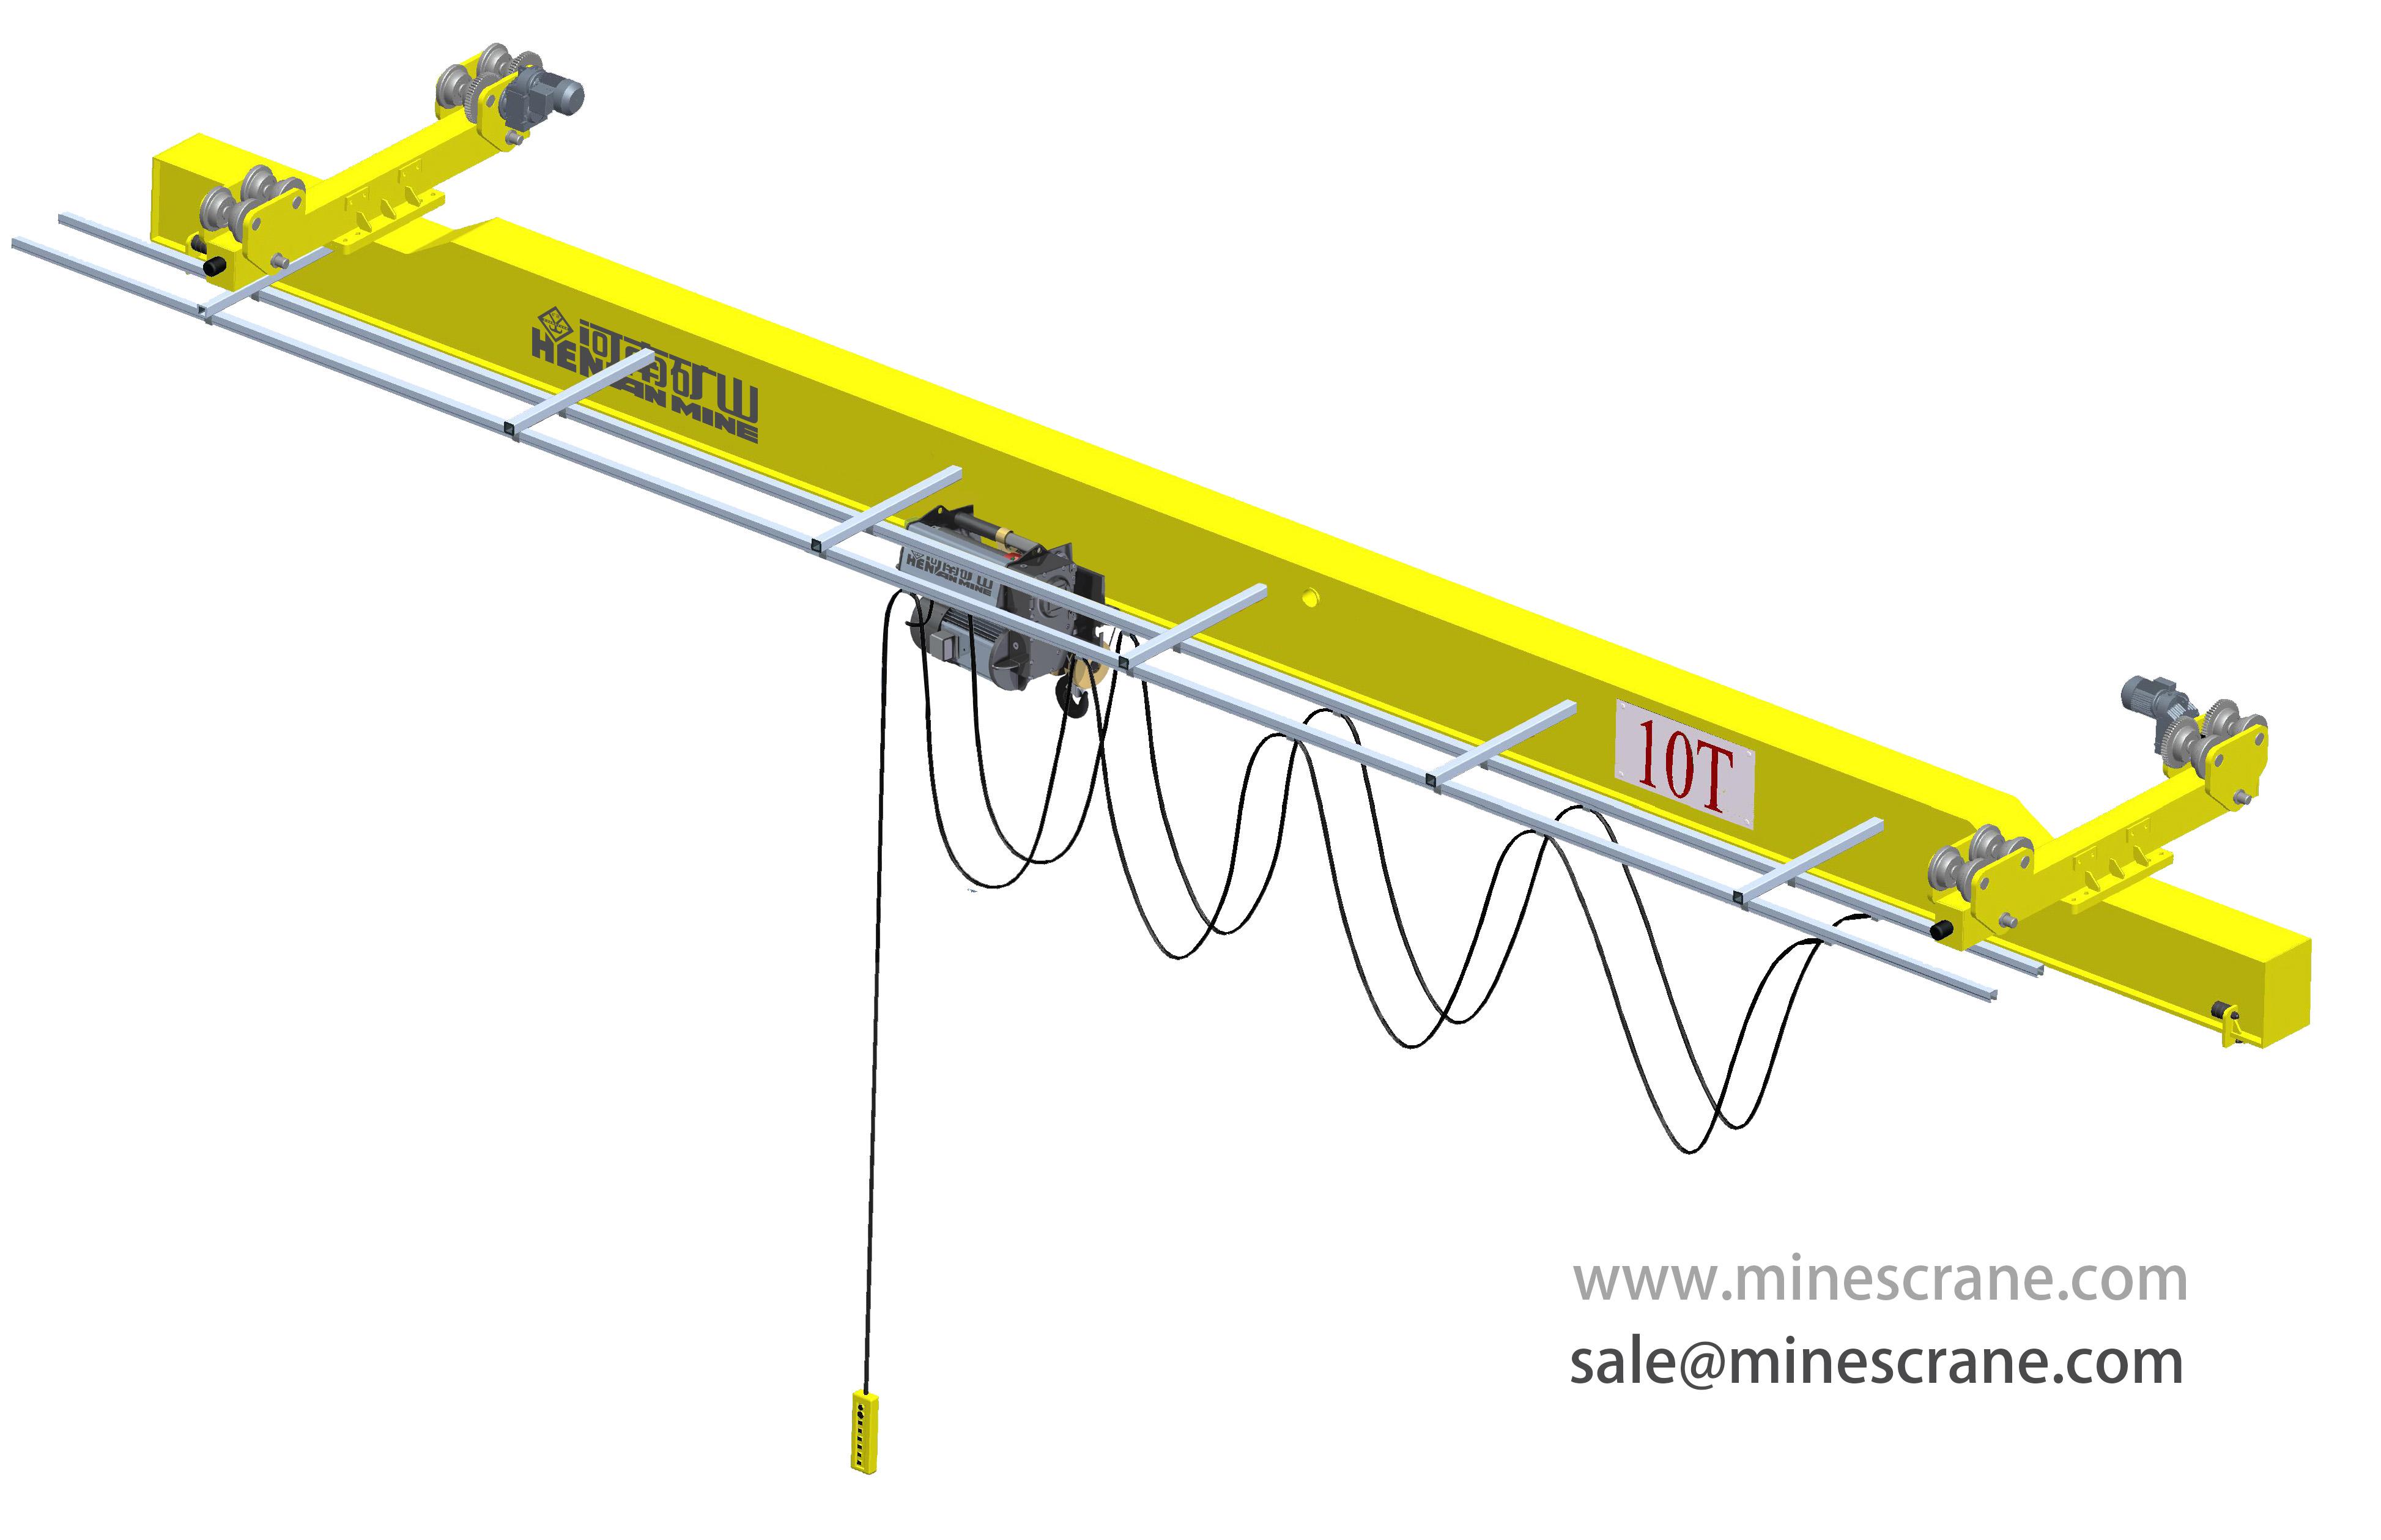 Underhung Single Girder Overhead Crane